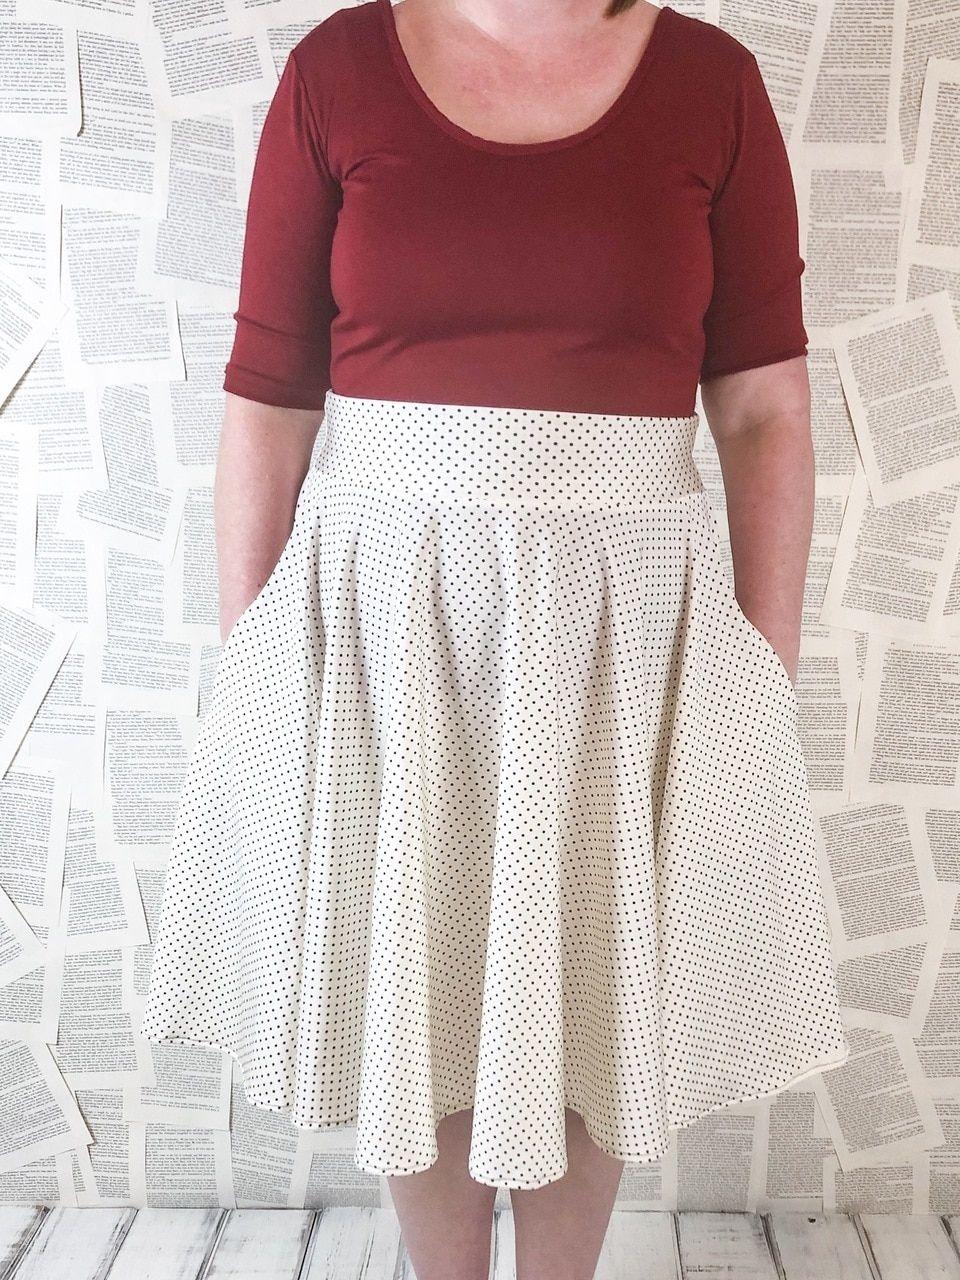 Duchess's Knit Circle Skirt Sizes XXS to 3X Adults PDF ...